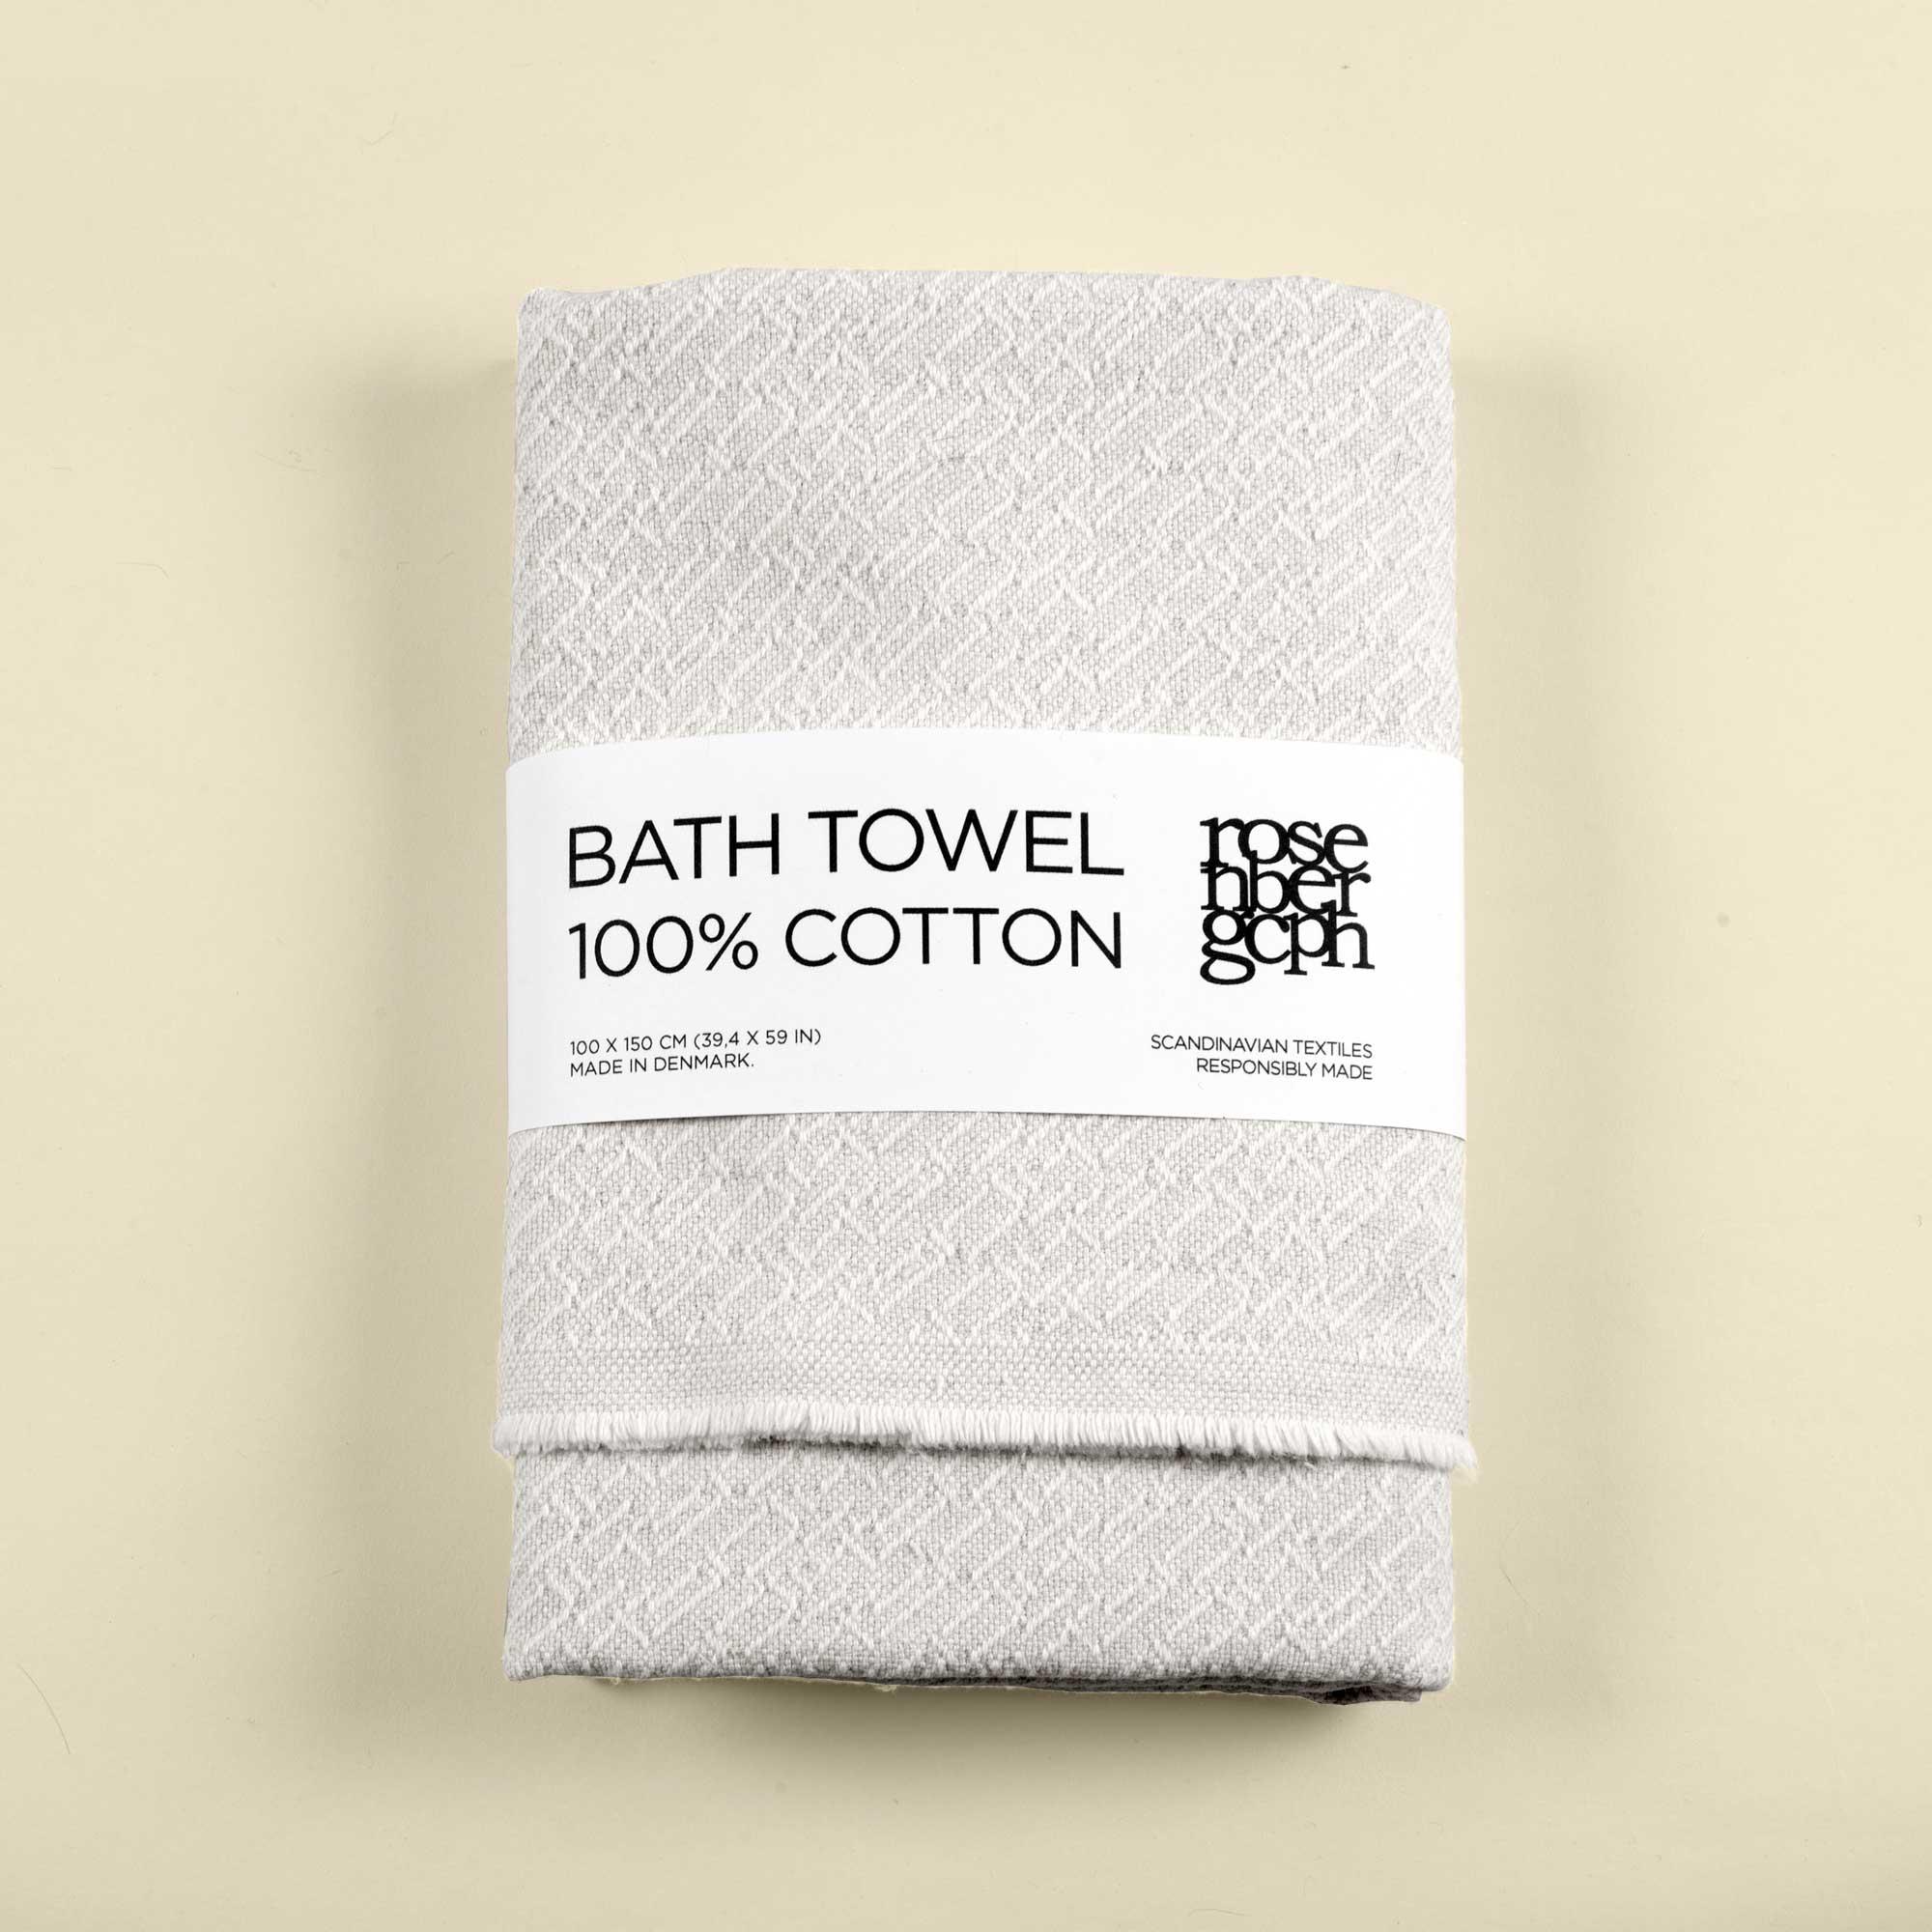 Bath towel, Mesh, 100% cotton, by RosenbergCph